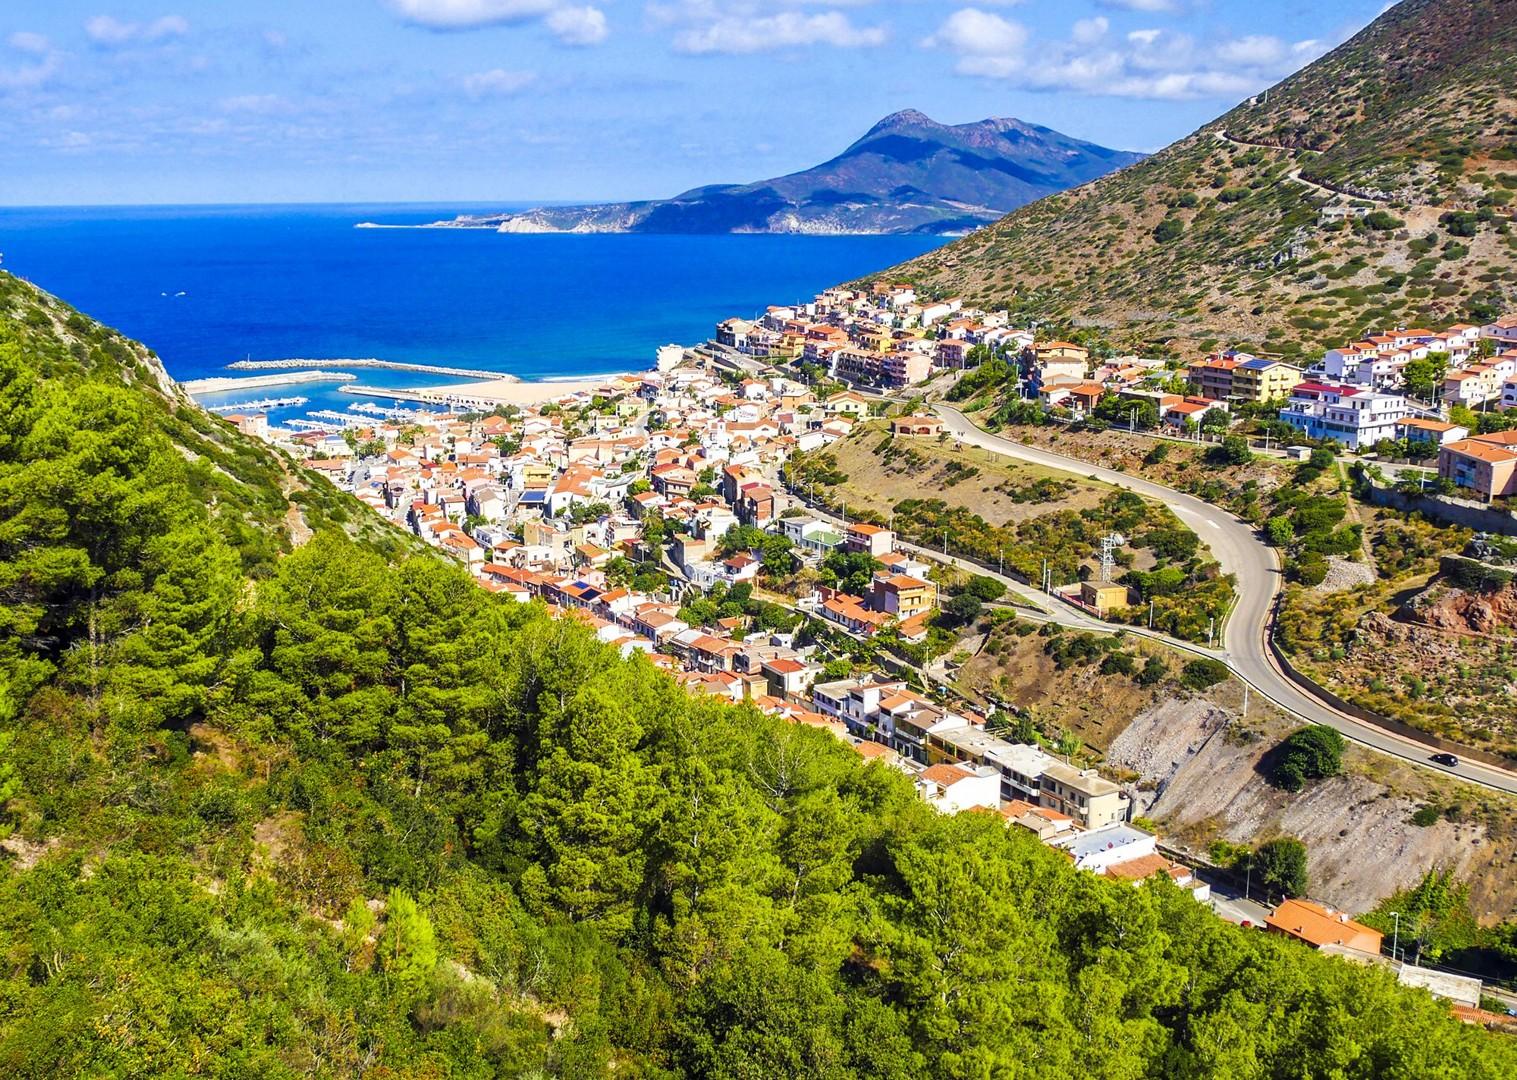 Buggeru and Capo Pecora-2.jpg - Italy - Sardinia - Island Flavours - Self-Guided Leisure Cycling Holiday - Italia Leisure and Family Cycling